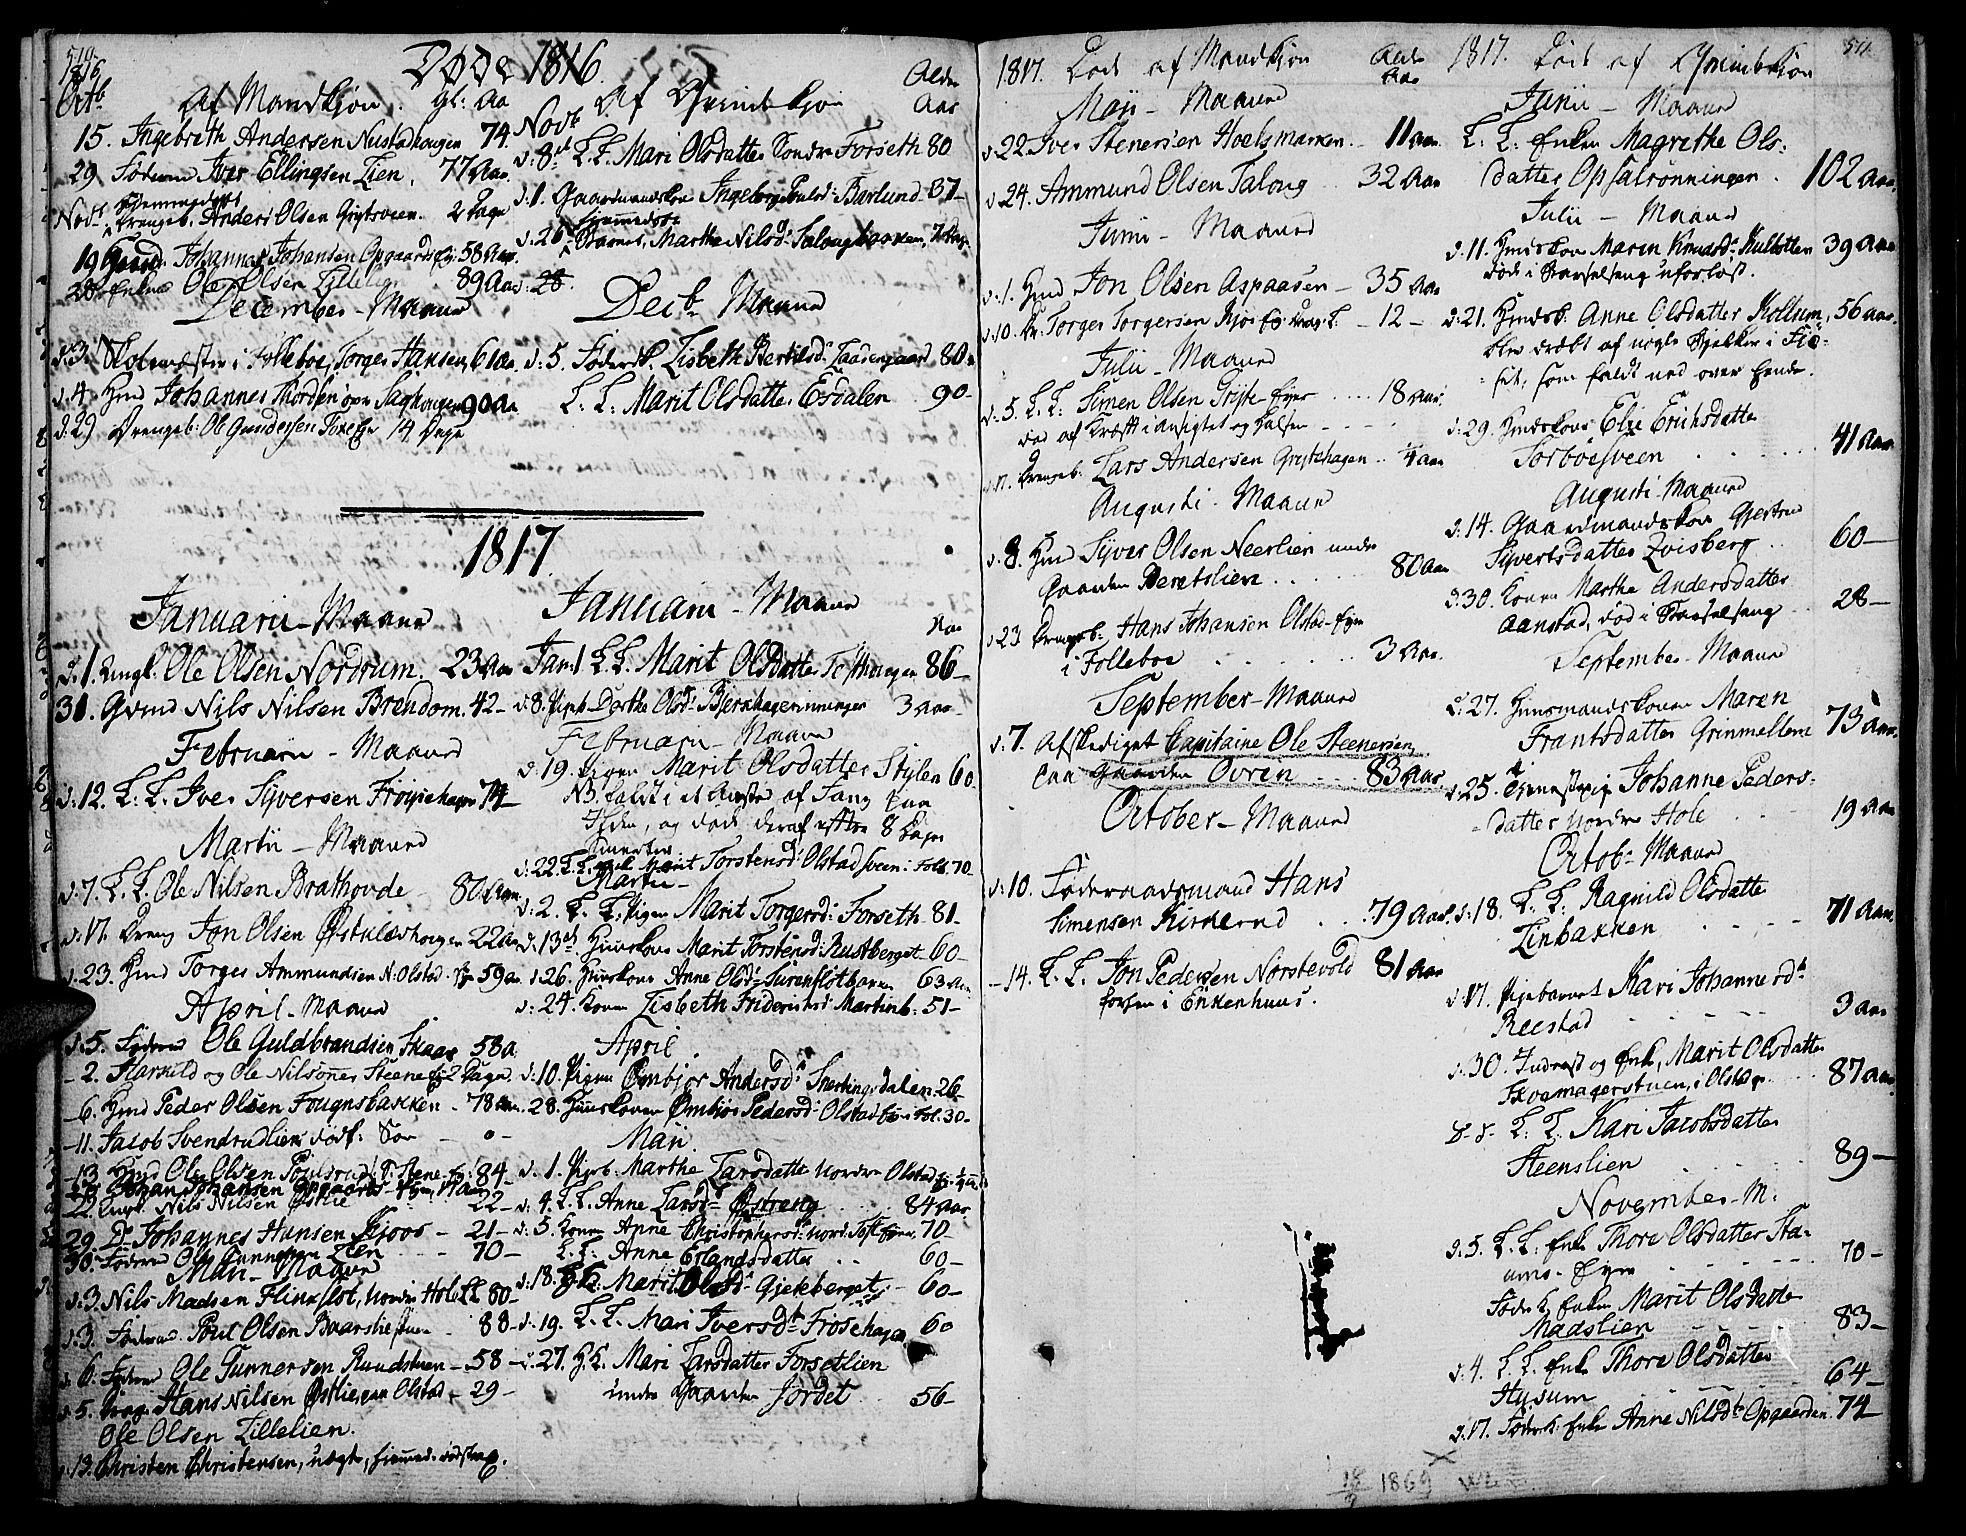 SAH, Gausdal prestekontor, Ministerialbok nr. 4, 1809-1817, s. 510-511